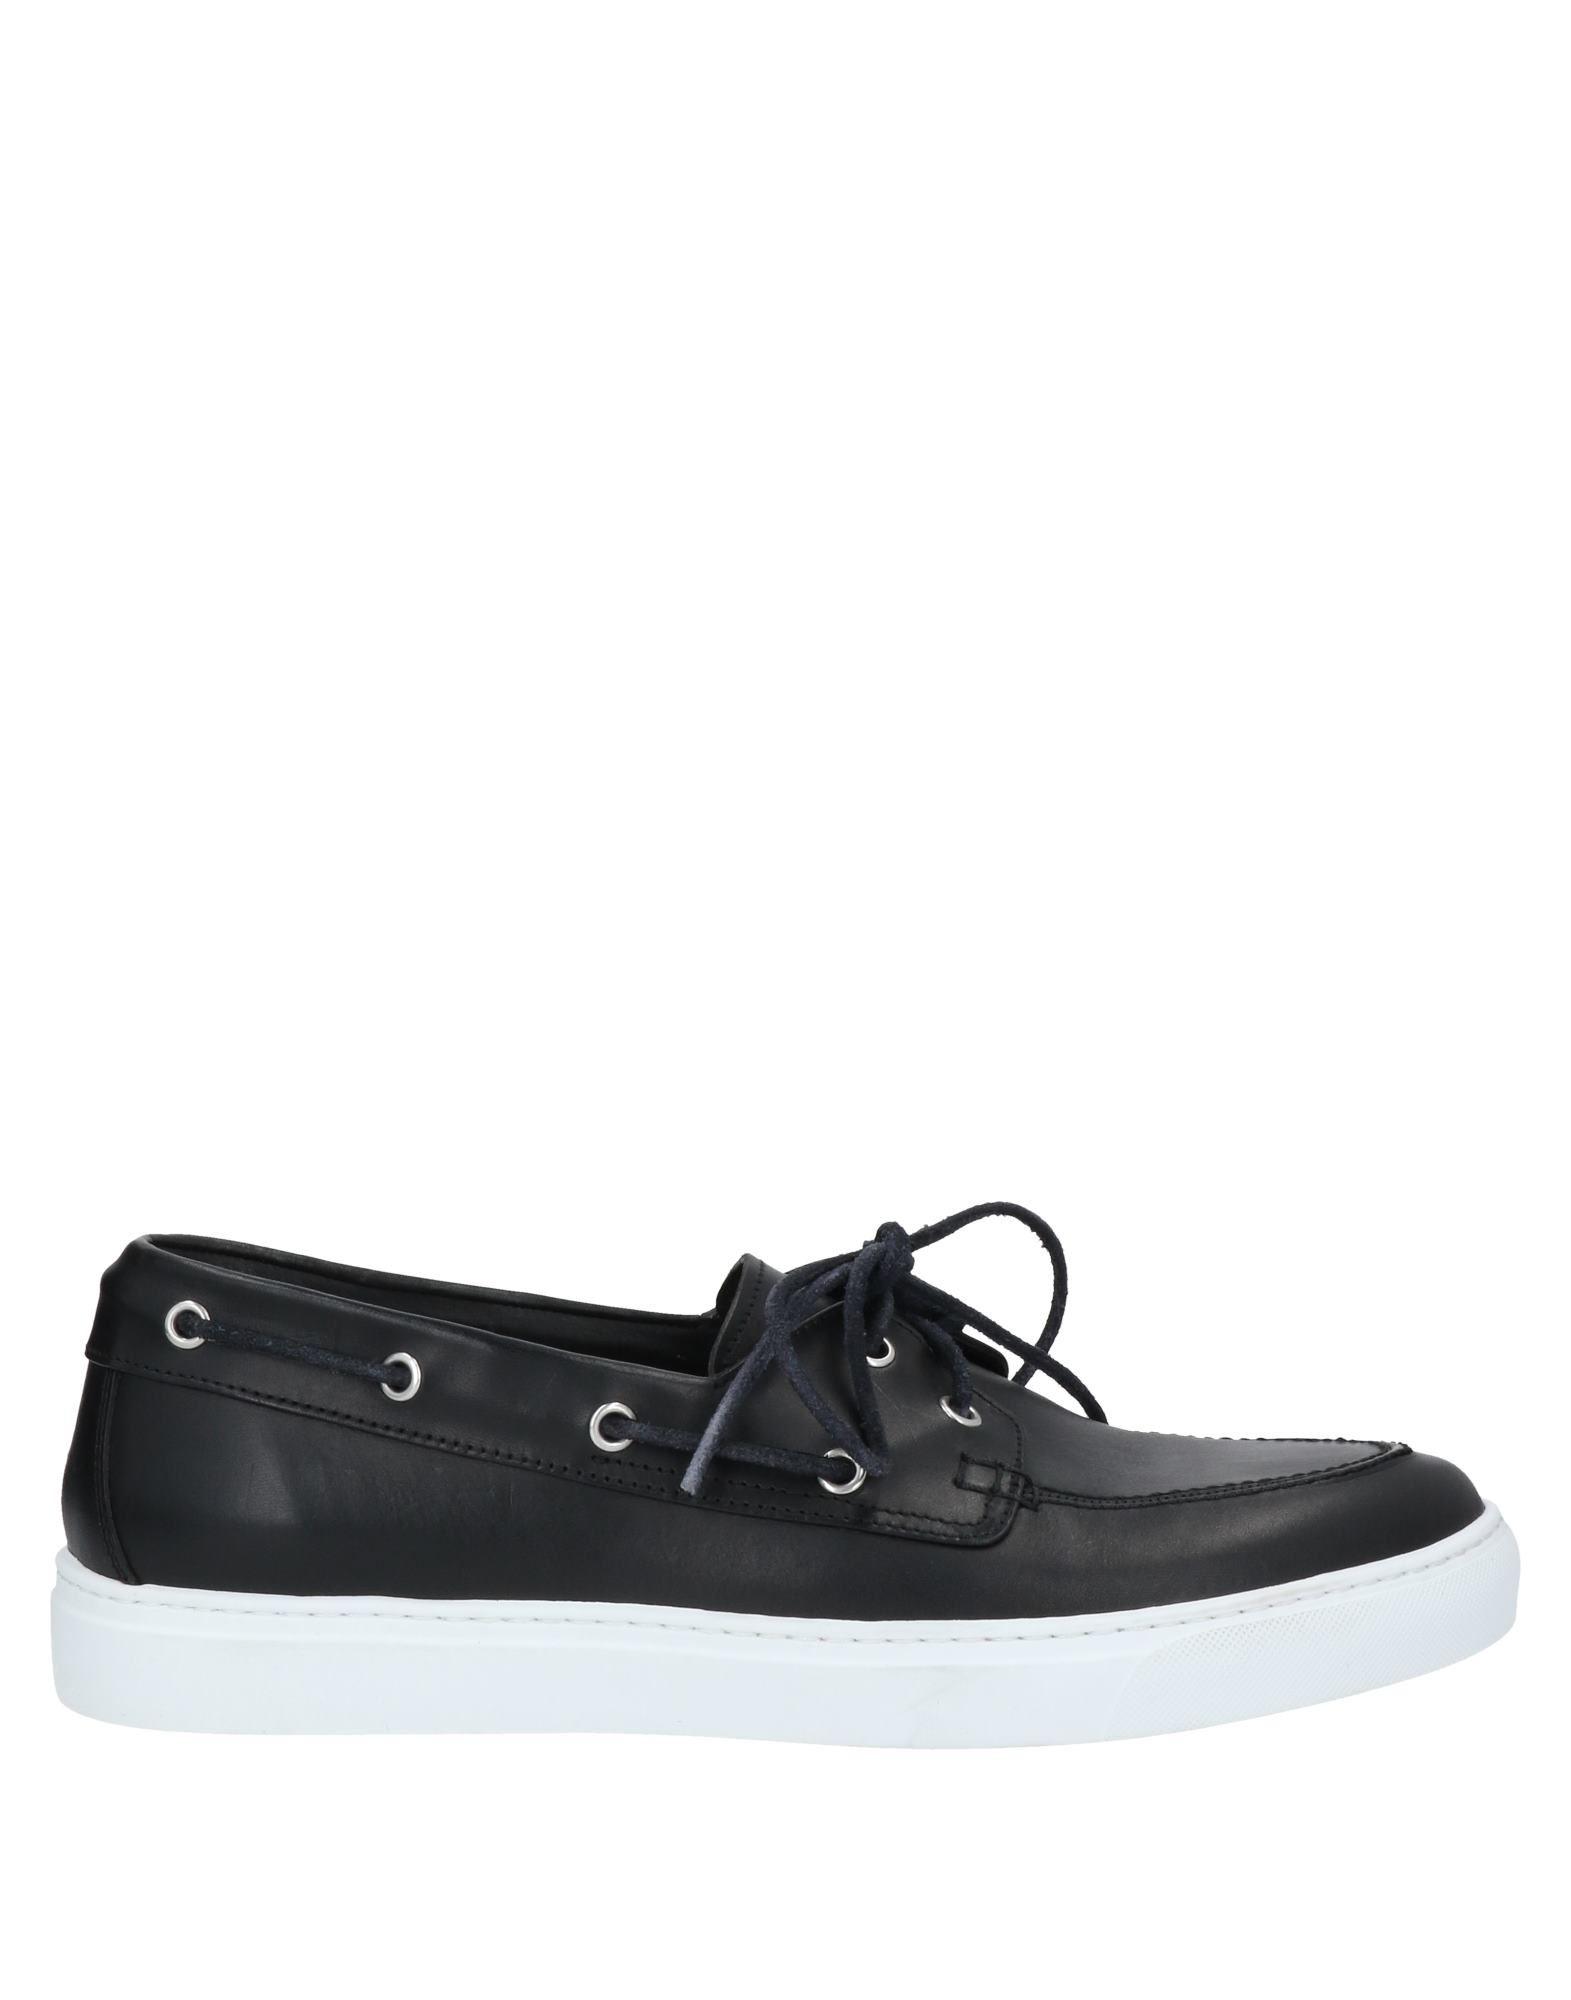 Henderson Baracco Loafers In Black